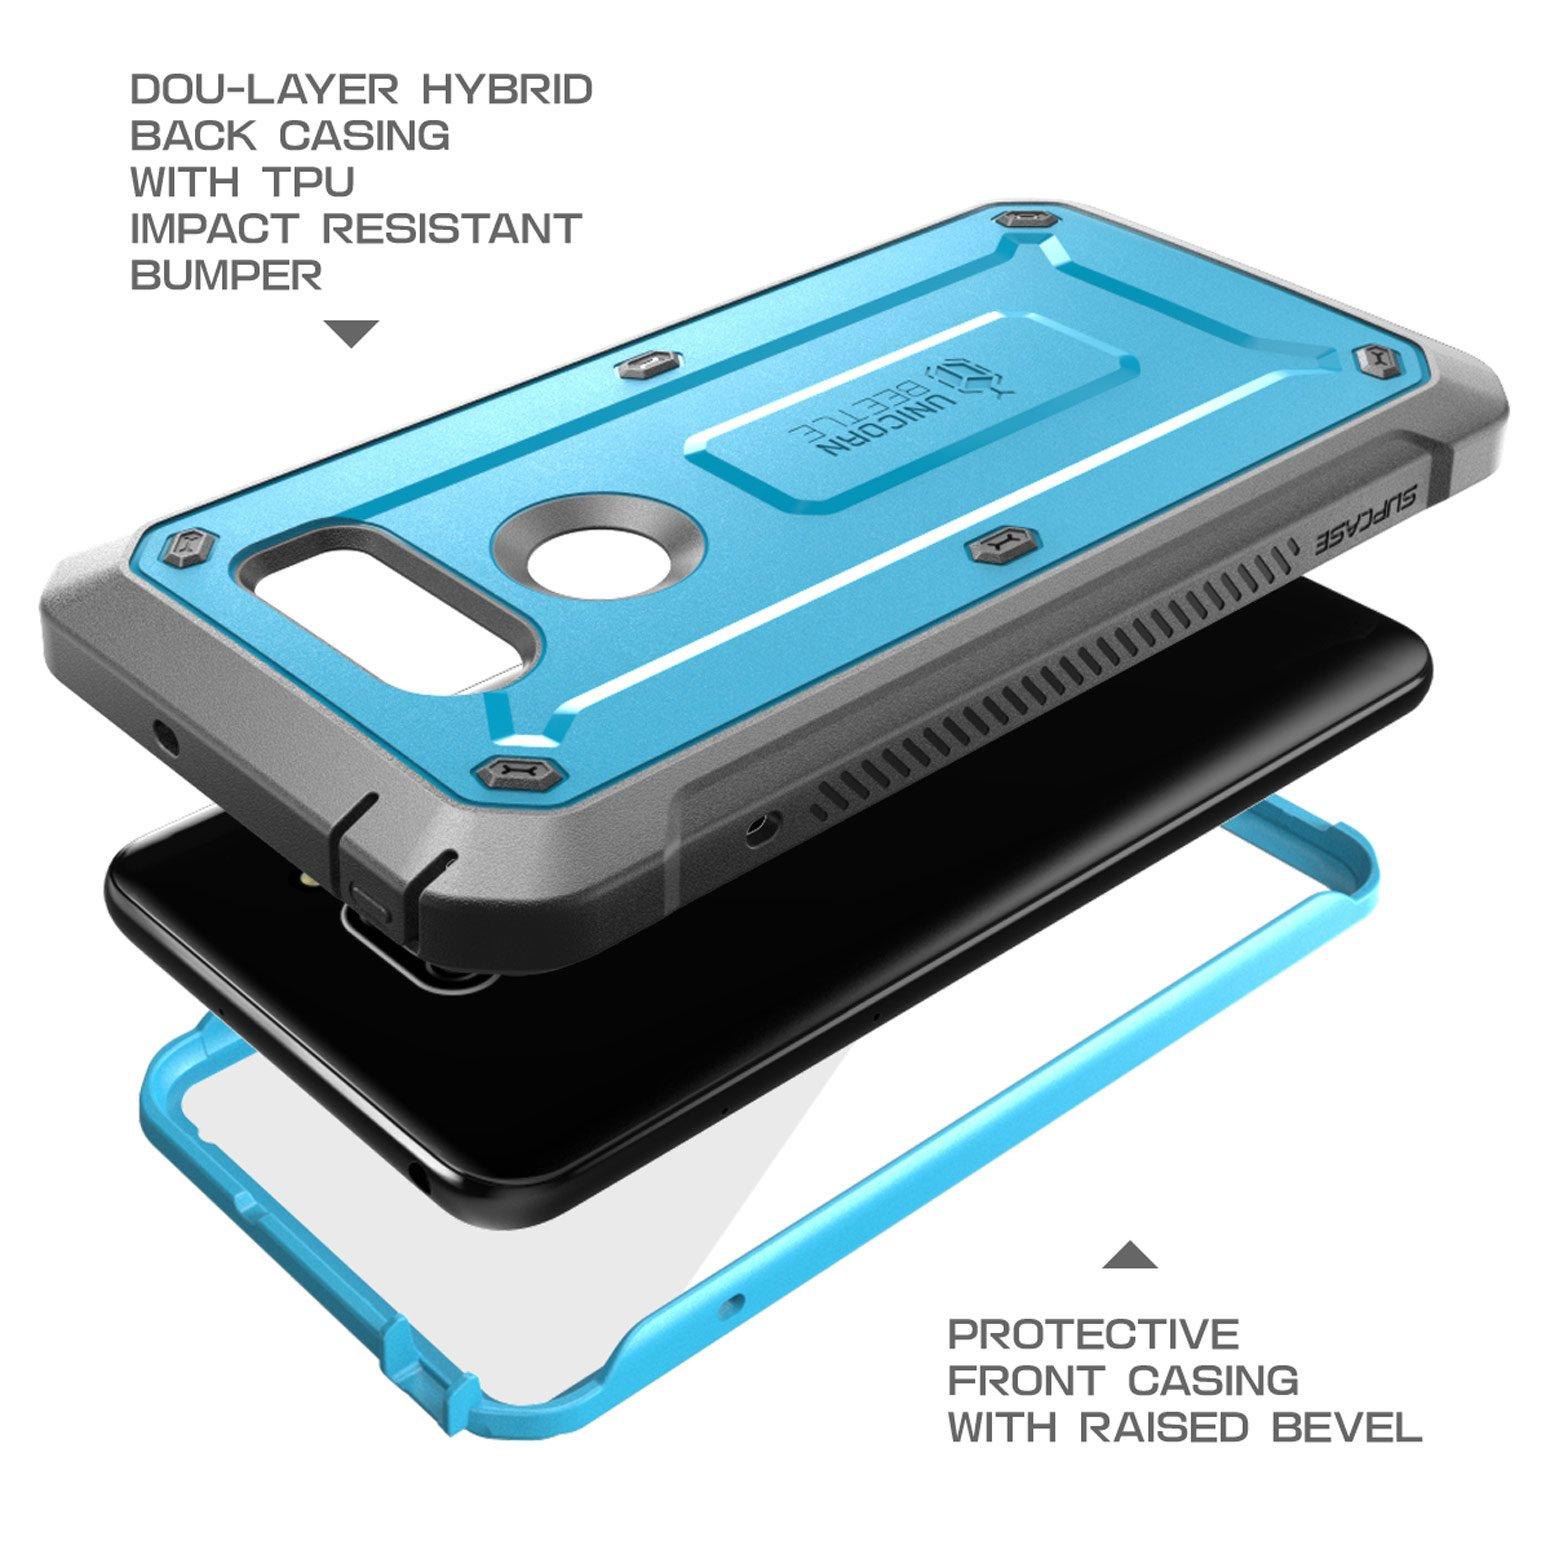 LG V30 Case, SUPCASE Full-body Rugged Holster Case with Built-in Screen Protector for LG V30, LG V30s,LG V35,LG V35 ThinQ,LG V30 Plus 2017 Release, Unicorn Beetle PRO Series(Blue/Gray) by SUPCASE (Image #4)